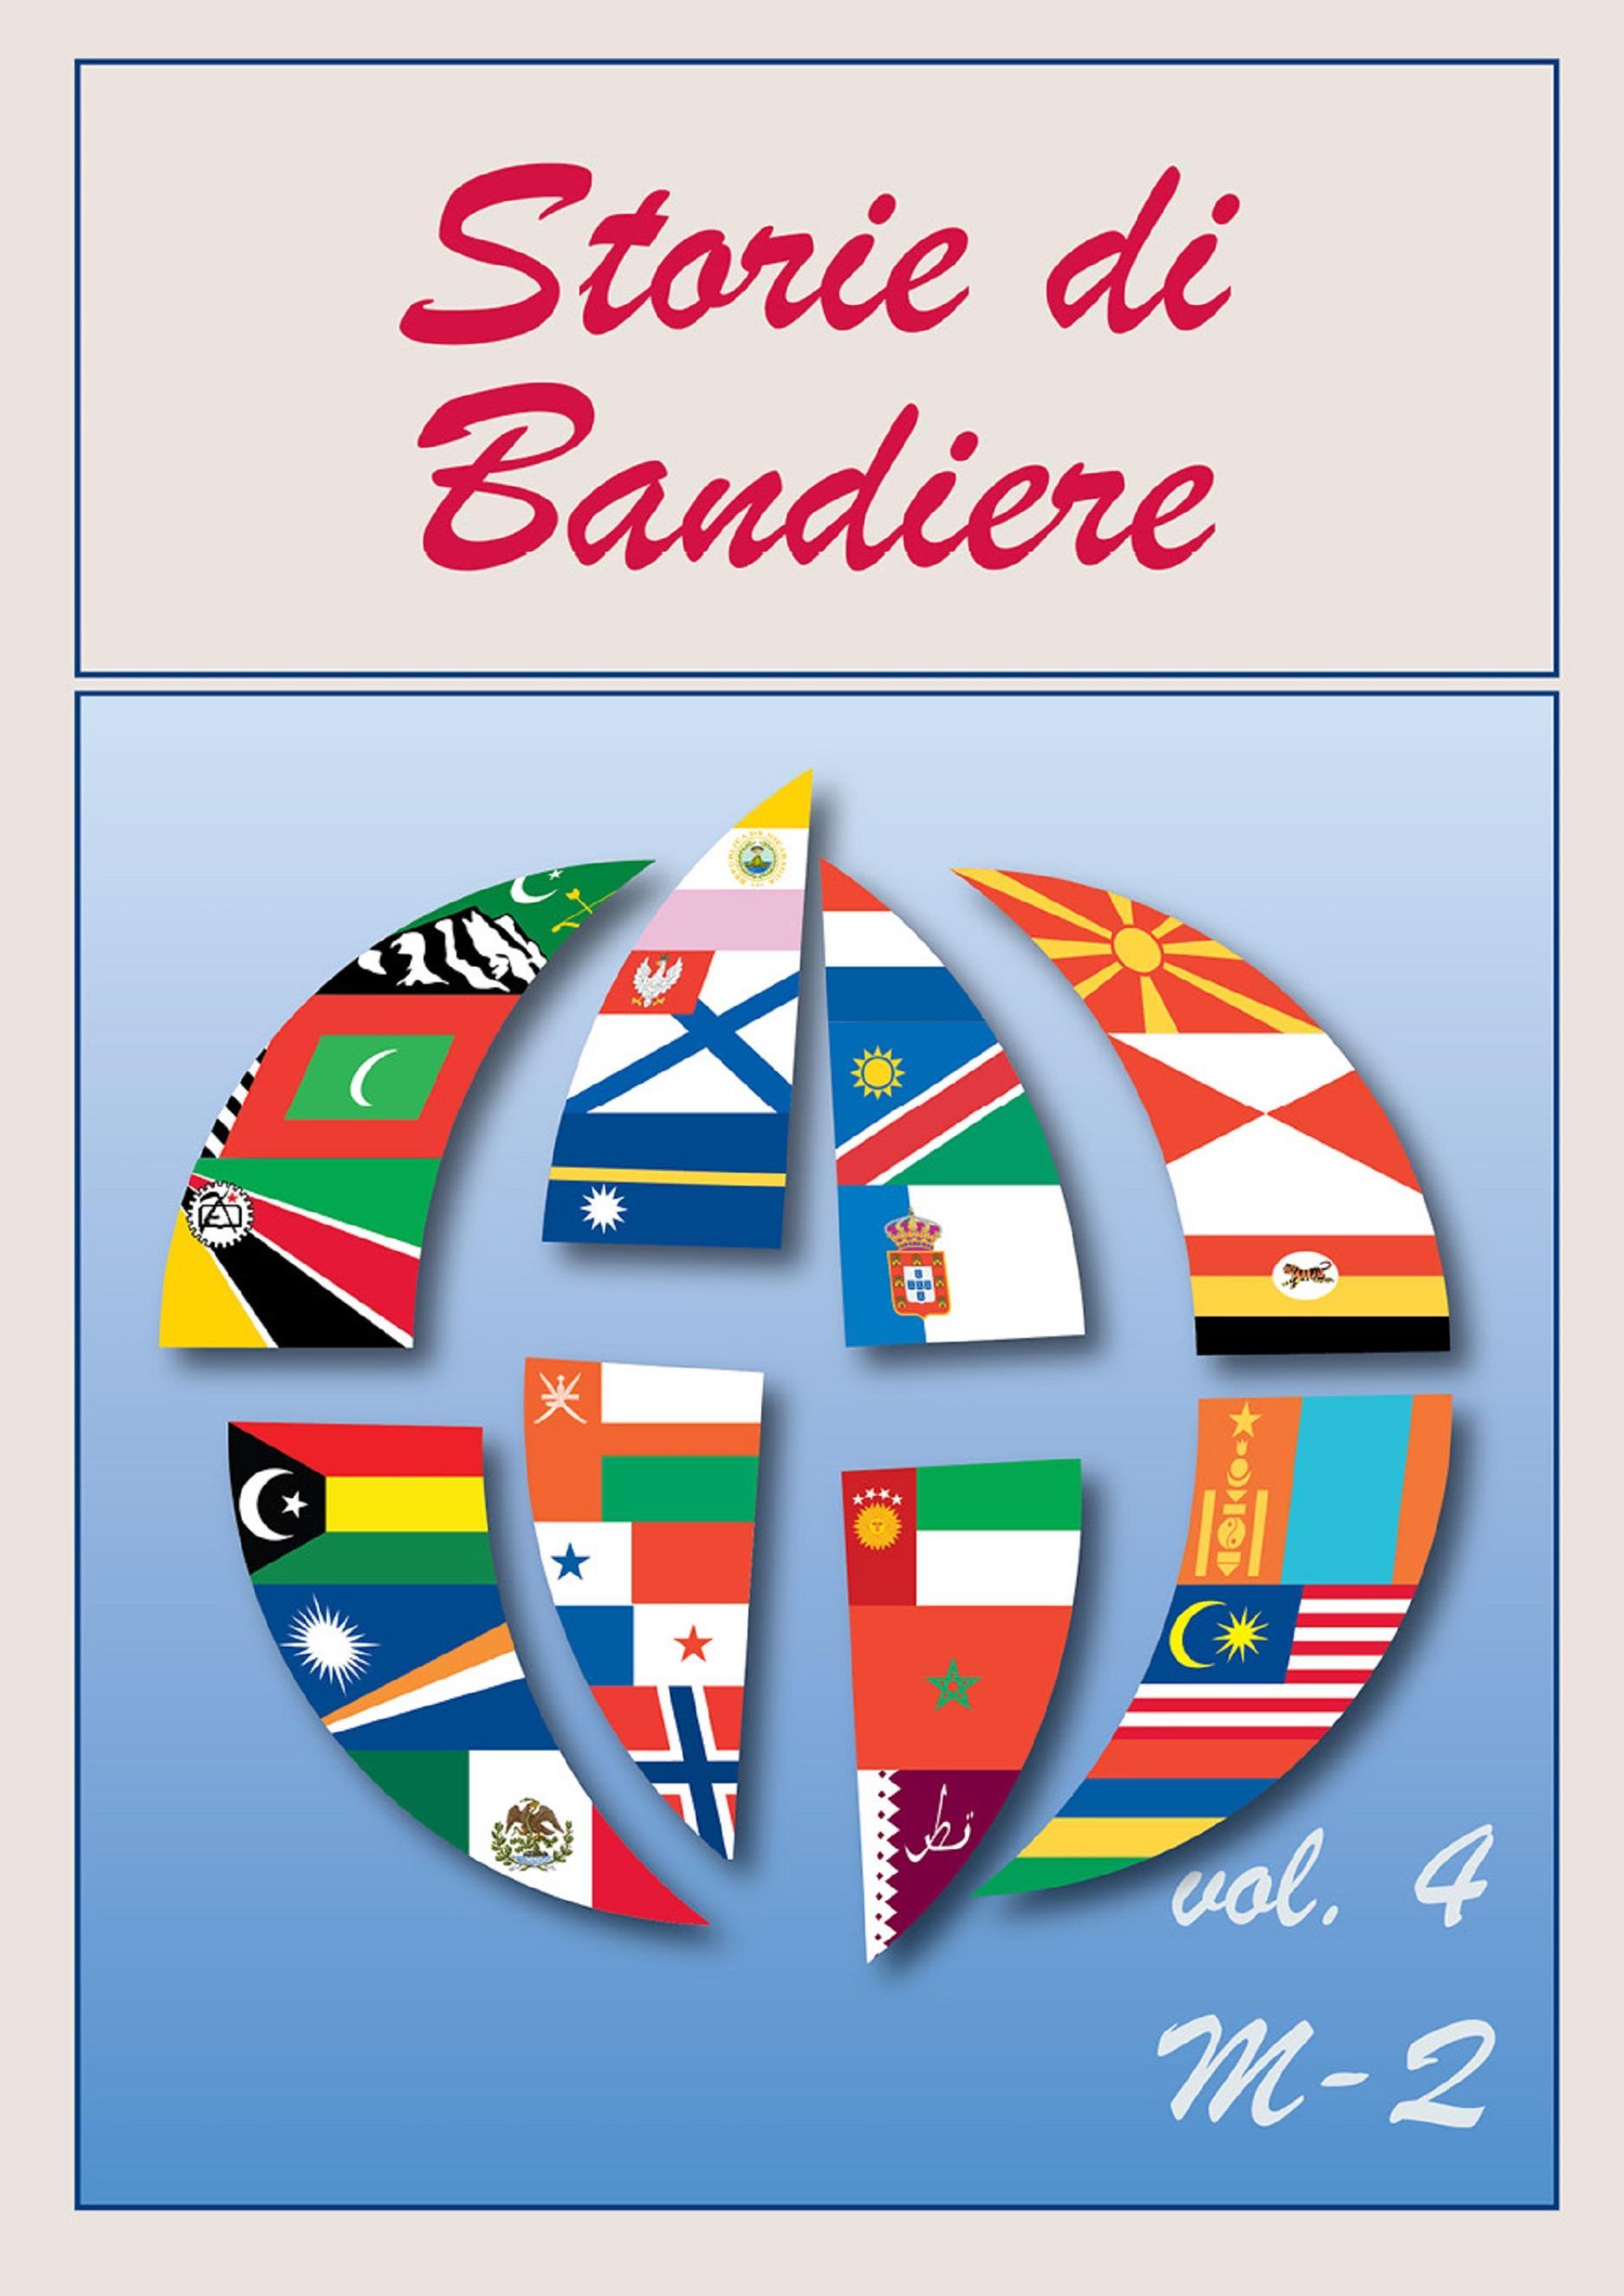 Storie di Bandiere vol. 4 M-Q